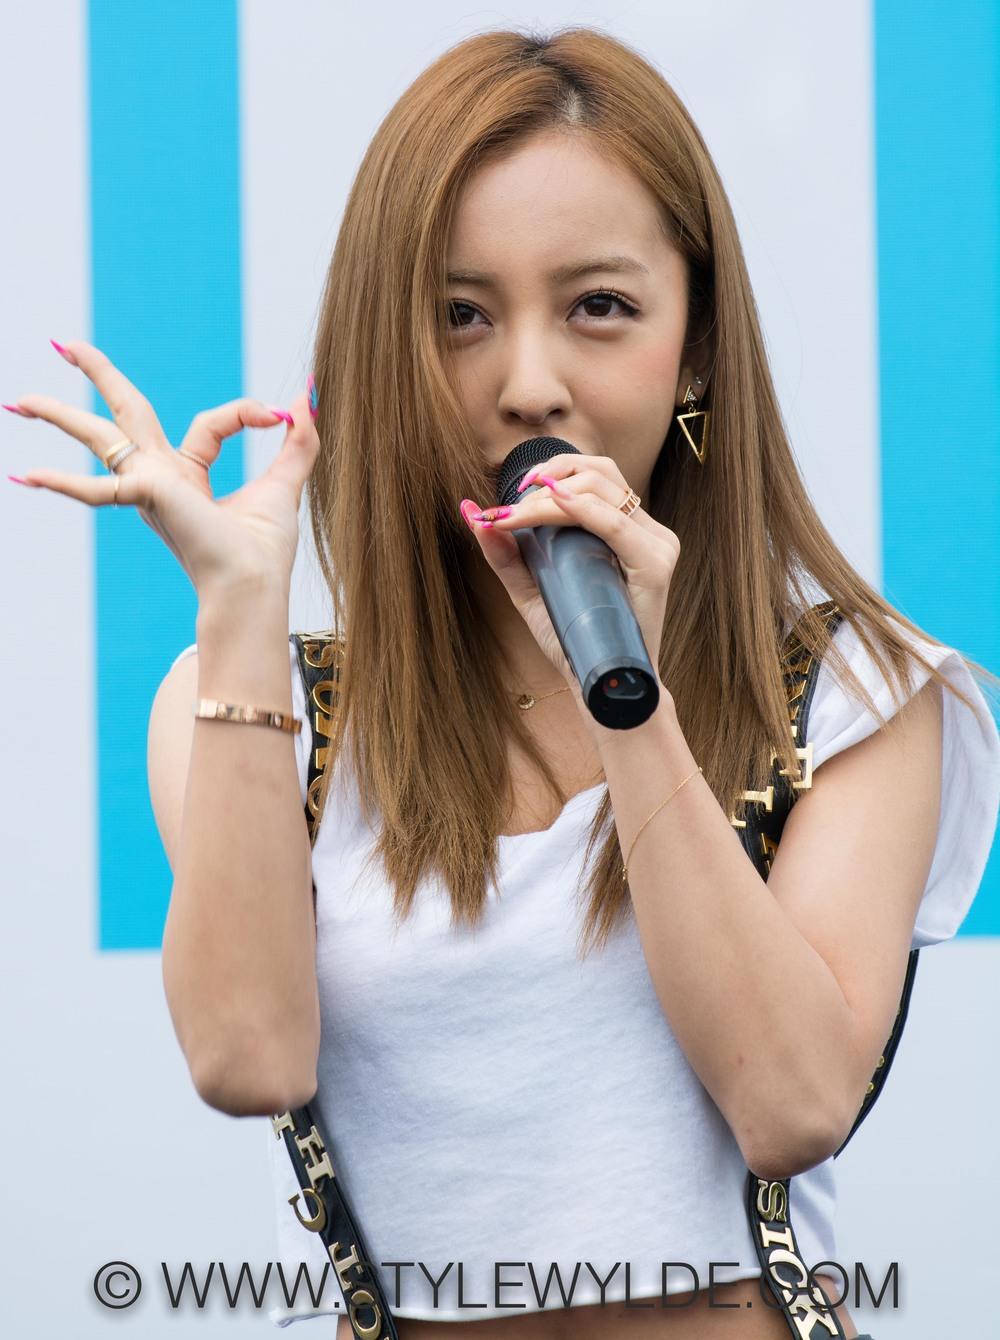 stylewylde_tomomi_itano_concert-1.jpg